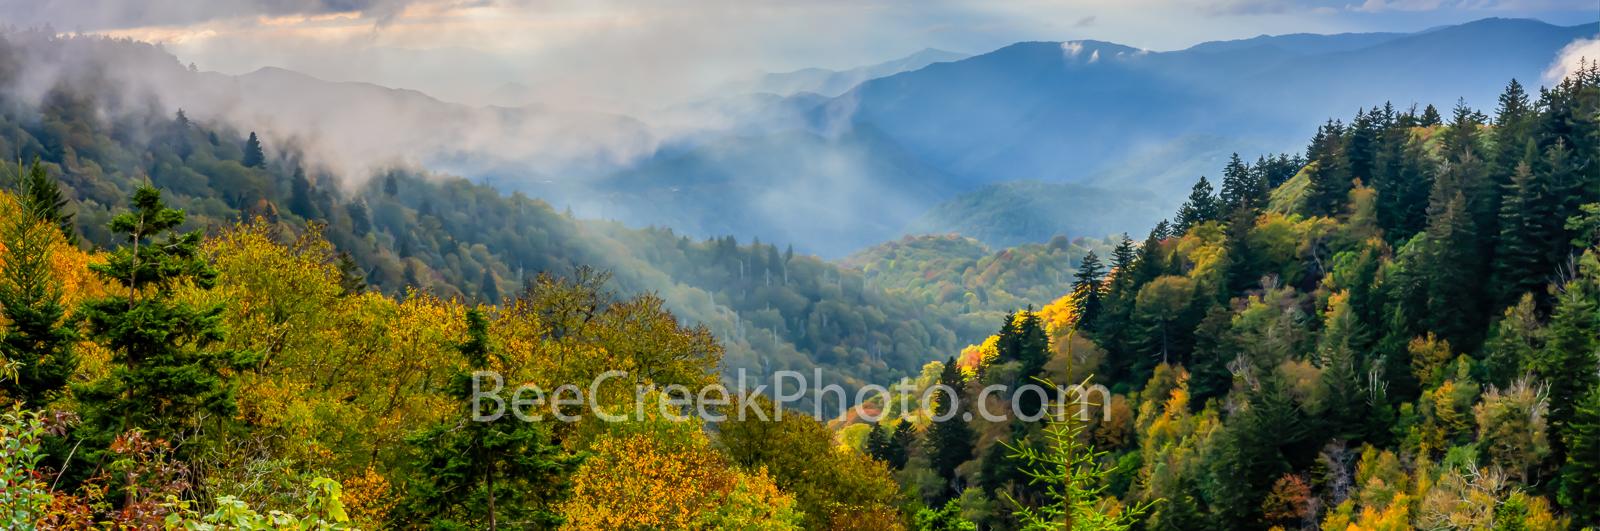 Smoky mountains, rays, fall foliage, autumn, clouds, sun rays, shine, forest, fog, blue ridge mountains, hills valleys, North Carolina, NC, Tenessee, TN, Applachian,Applachian mountains, blue ridge, m, photo